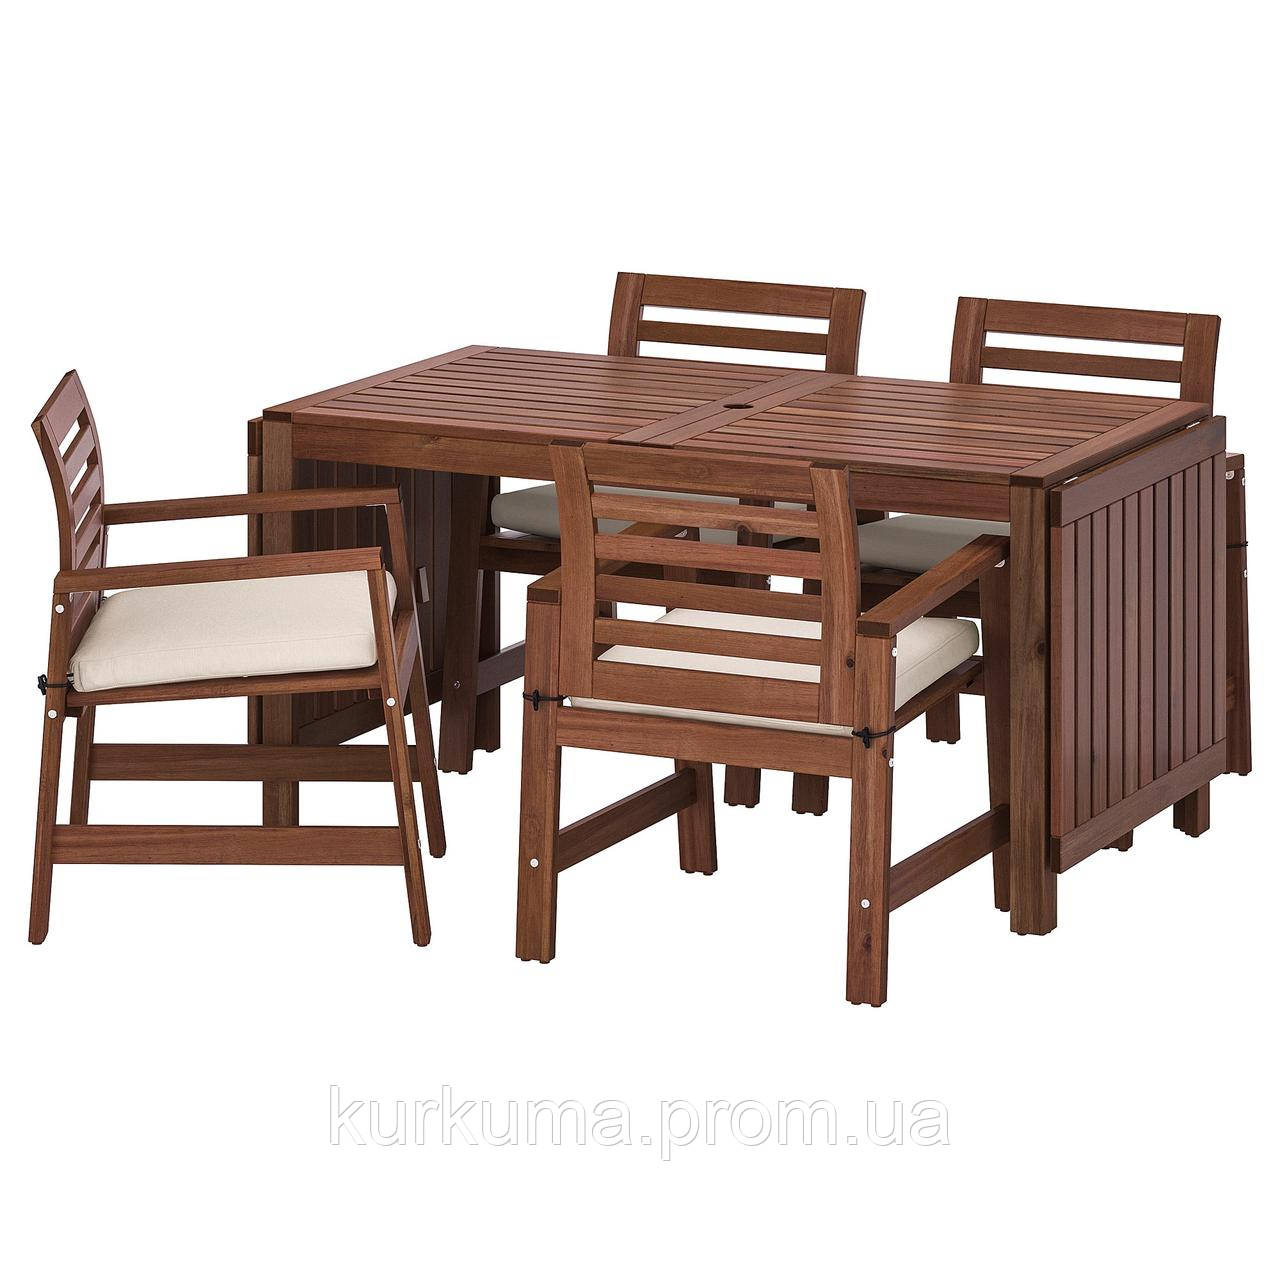 IKEA APPLARO Садовый стол и 4 стула, коричневая морилка (692.920.82)